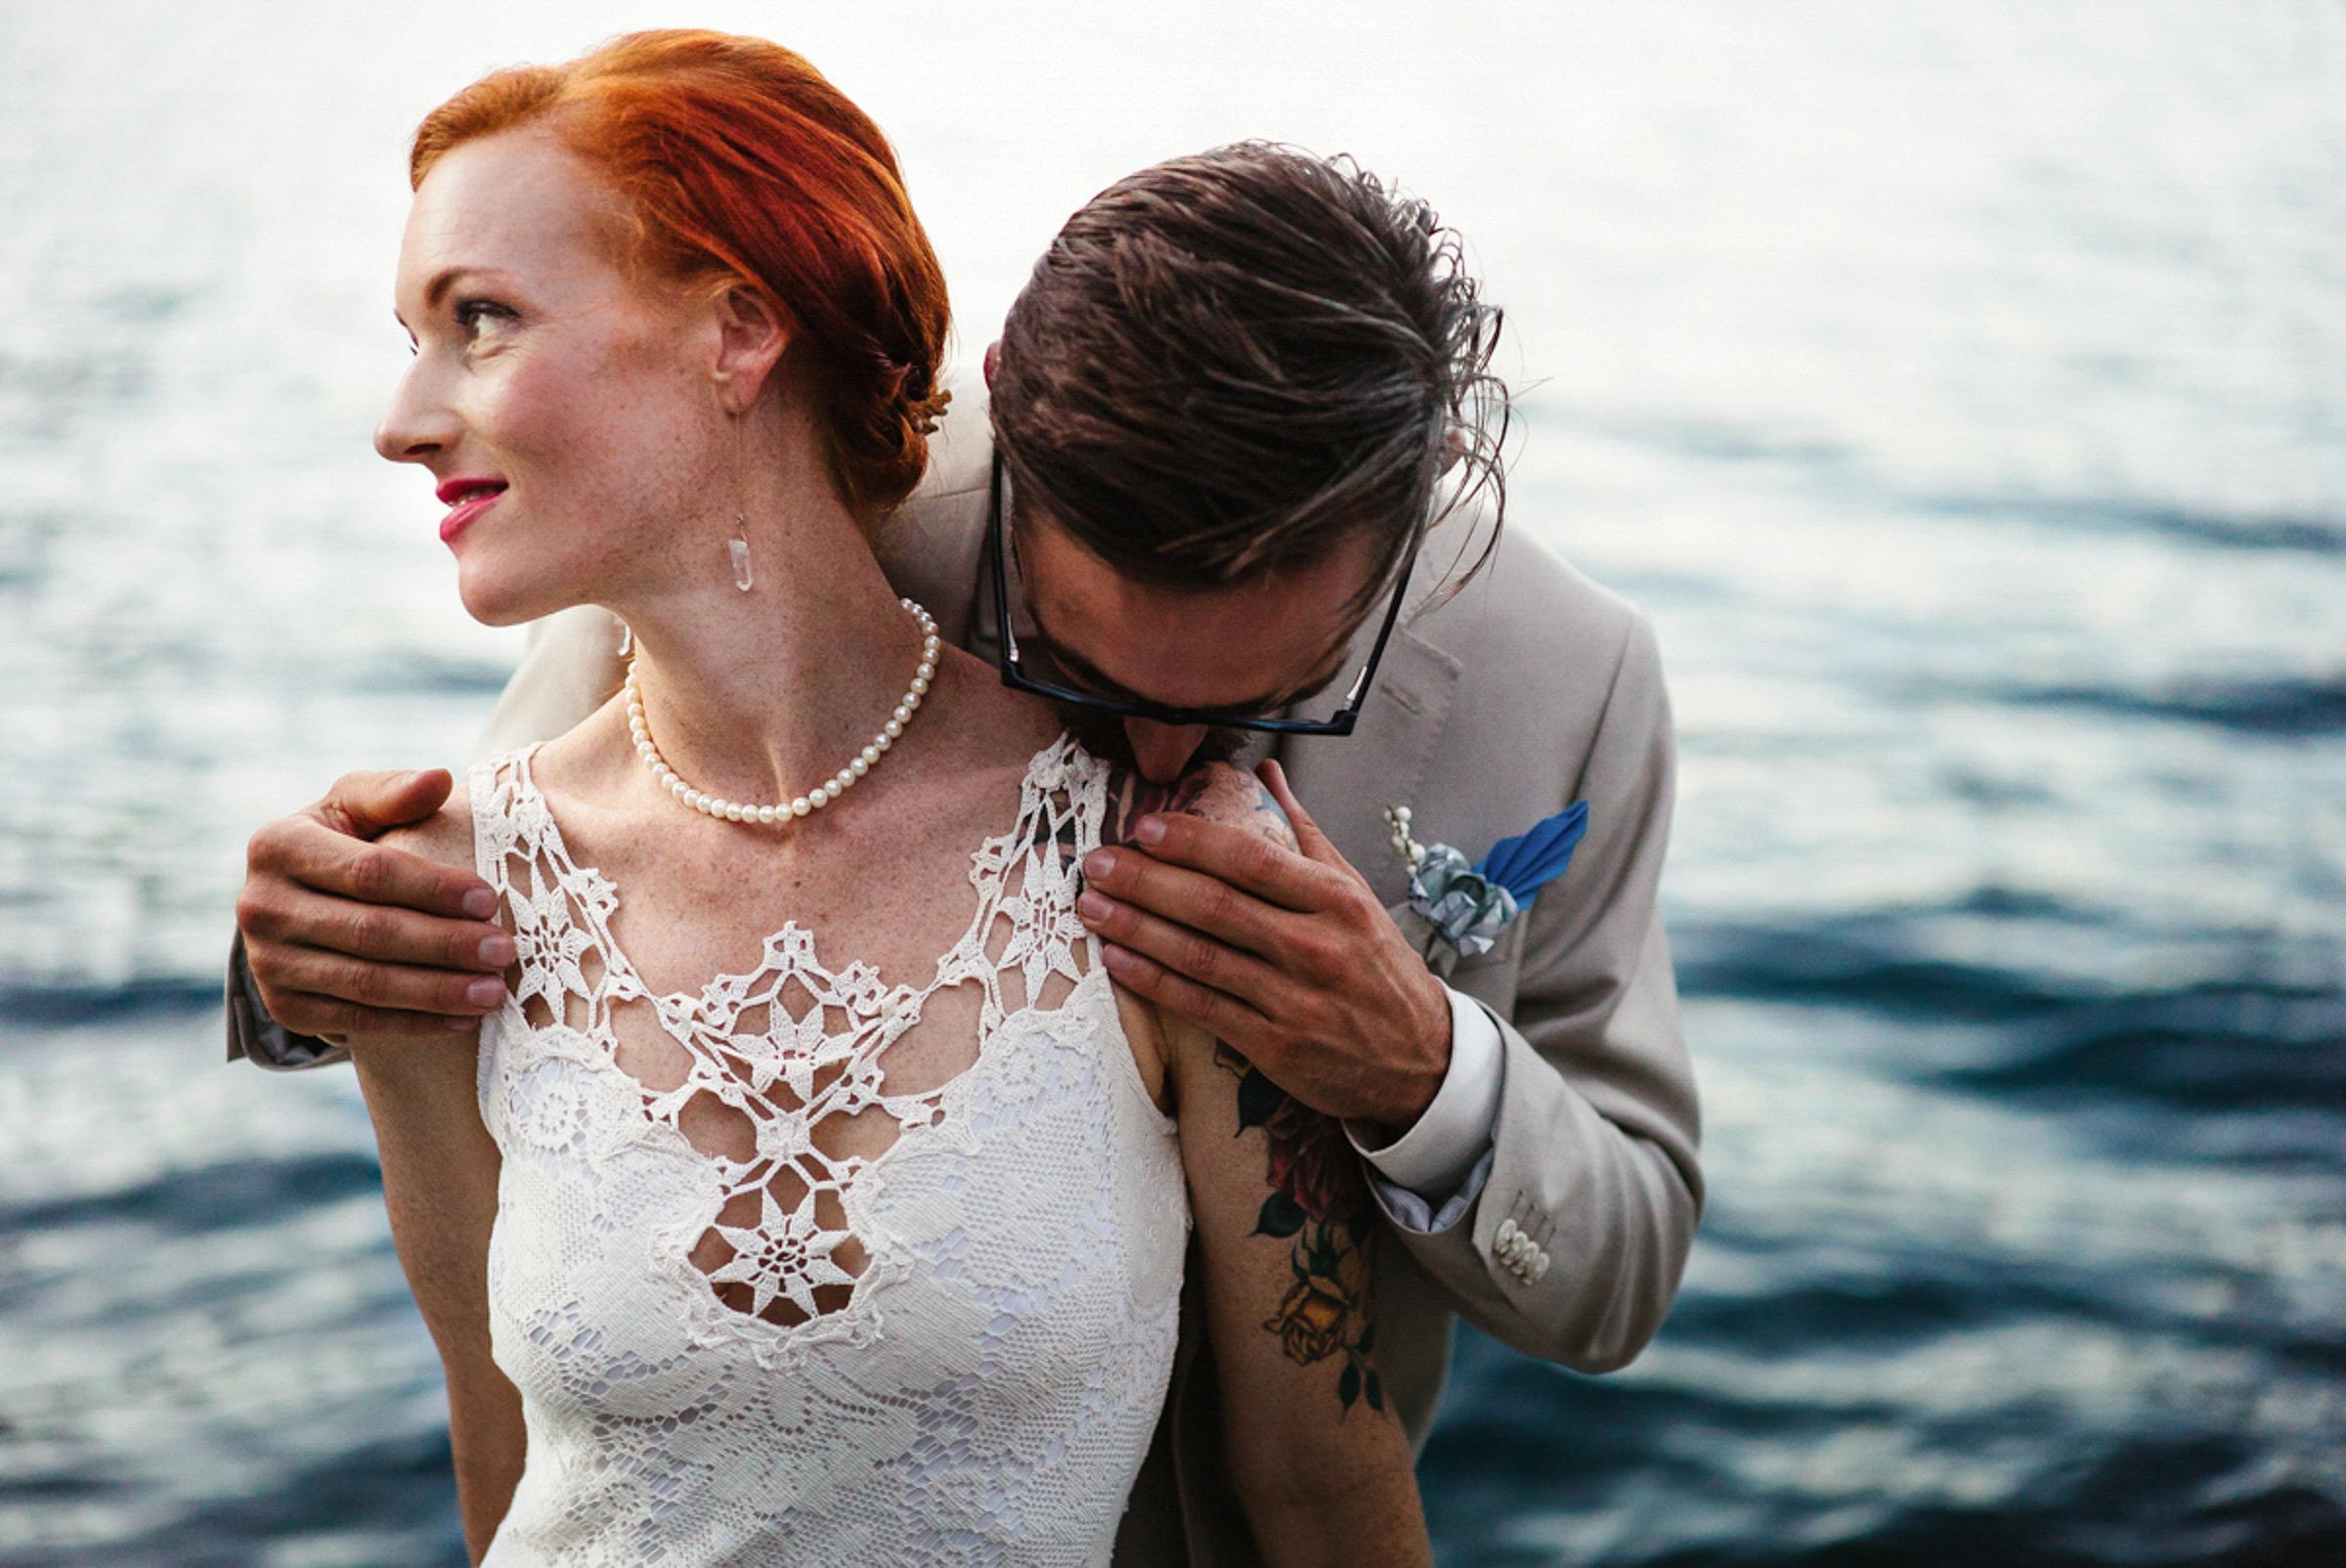 creative-composition-of-couple-in-the-sea-sasha-reiko-photography